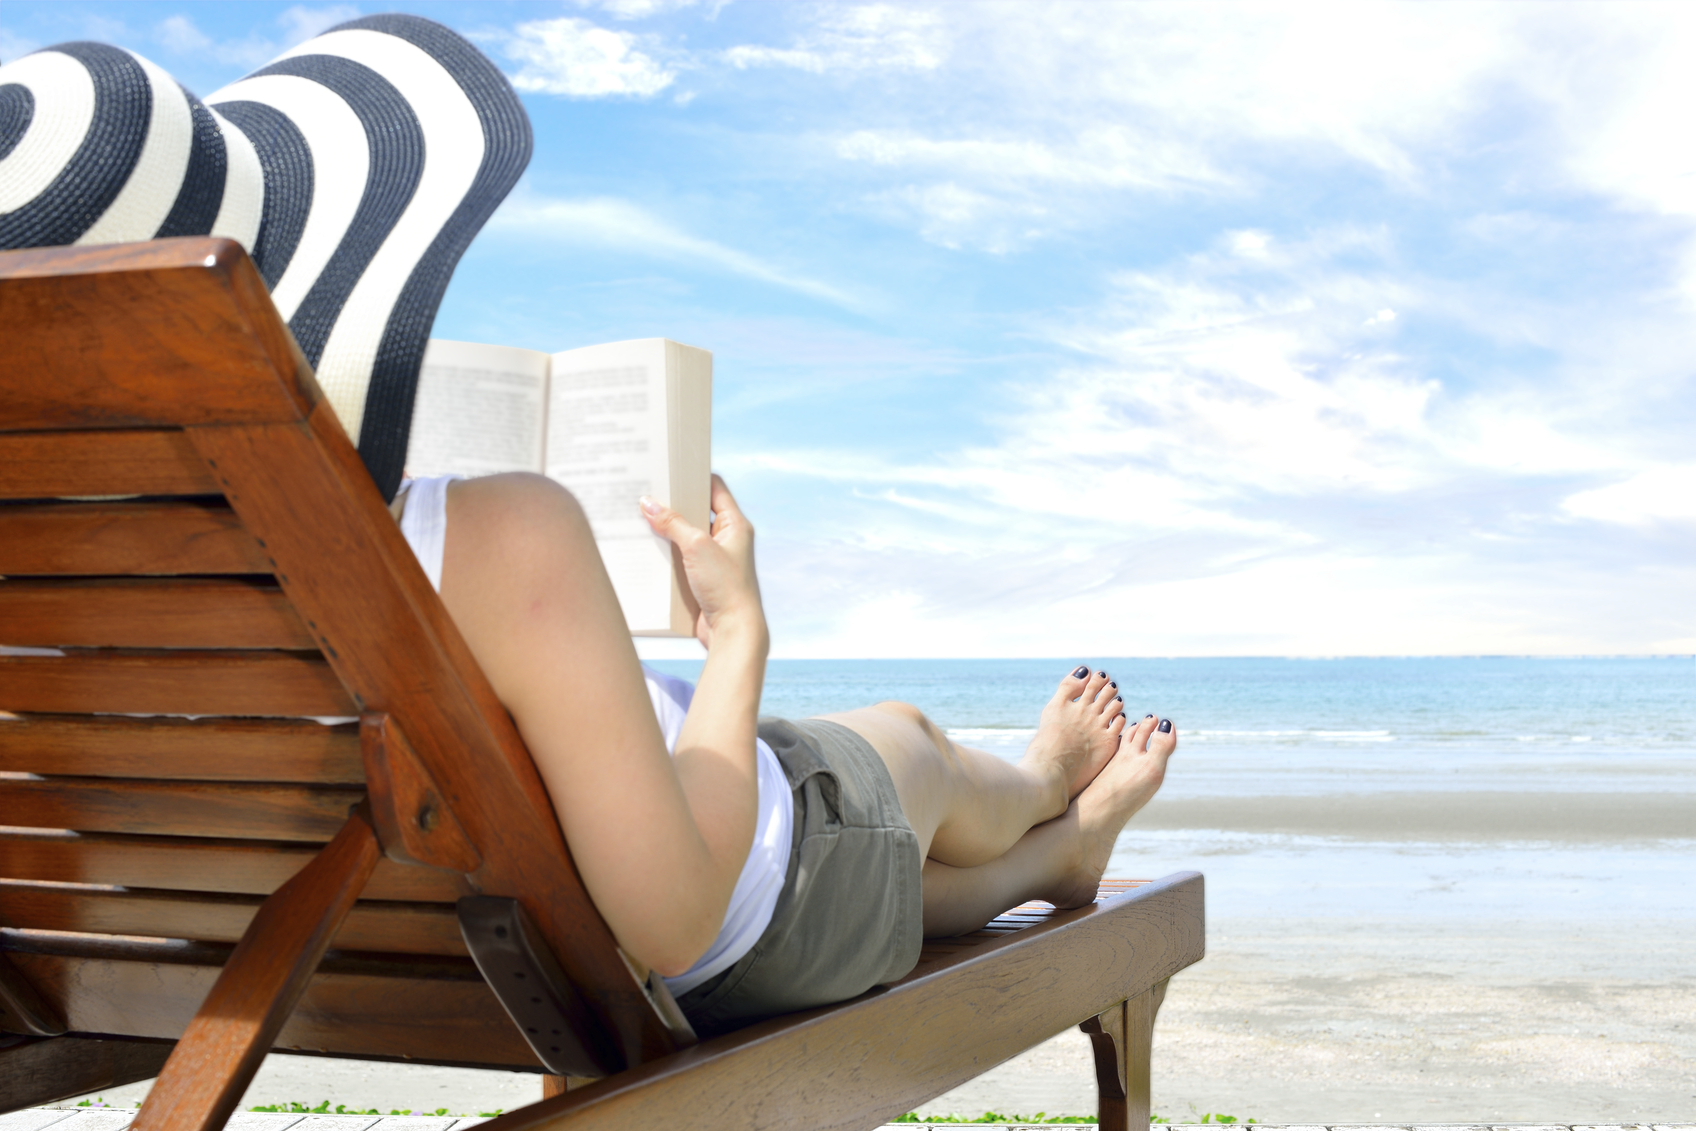 Regular meditation more beneficial than vacation